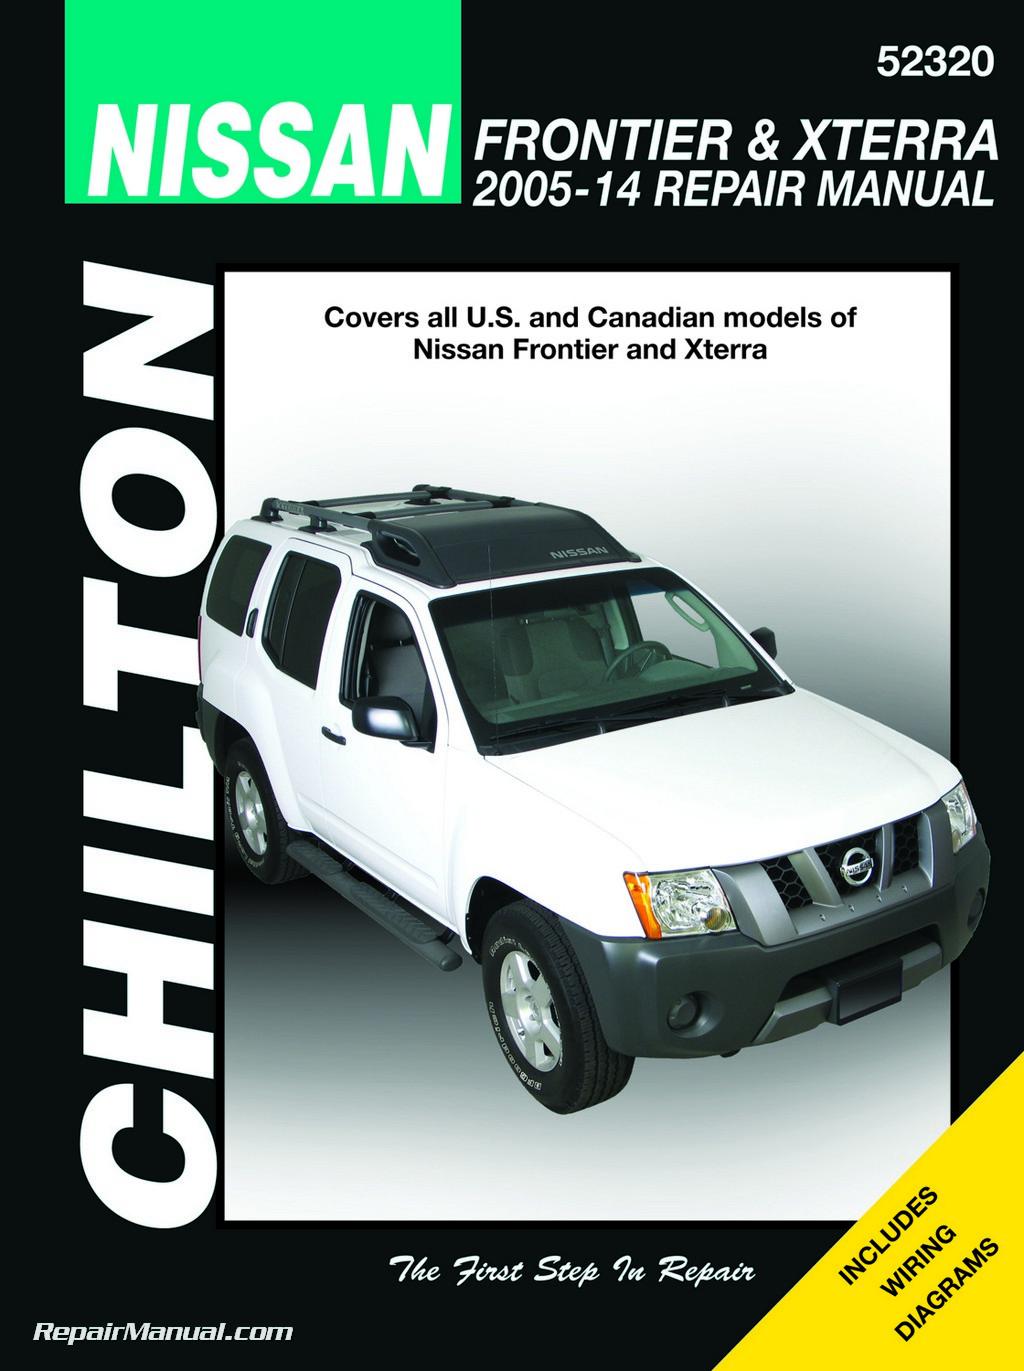 nissan frontier service repair manual 2005 2009